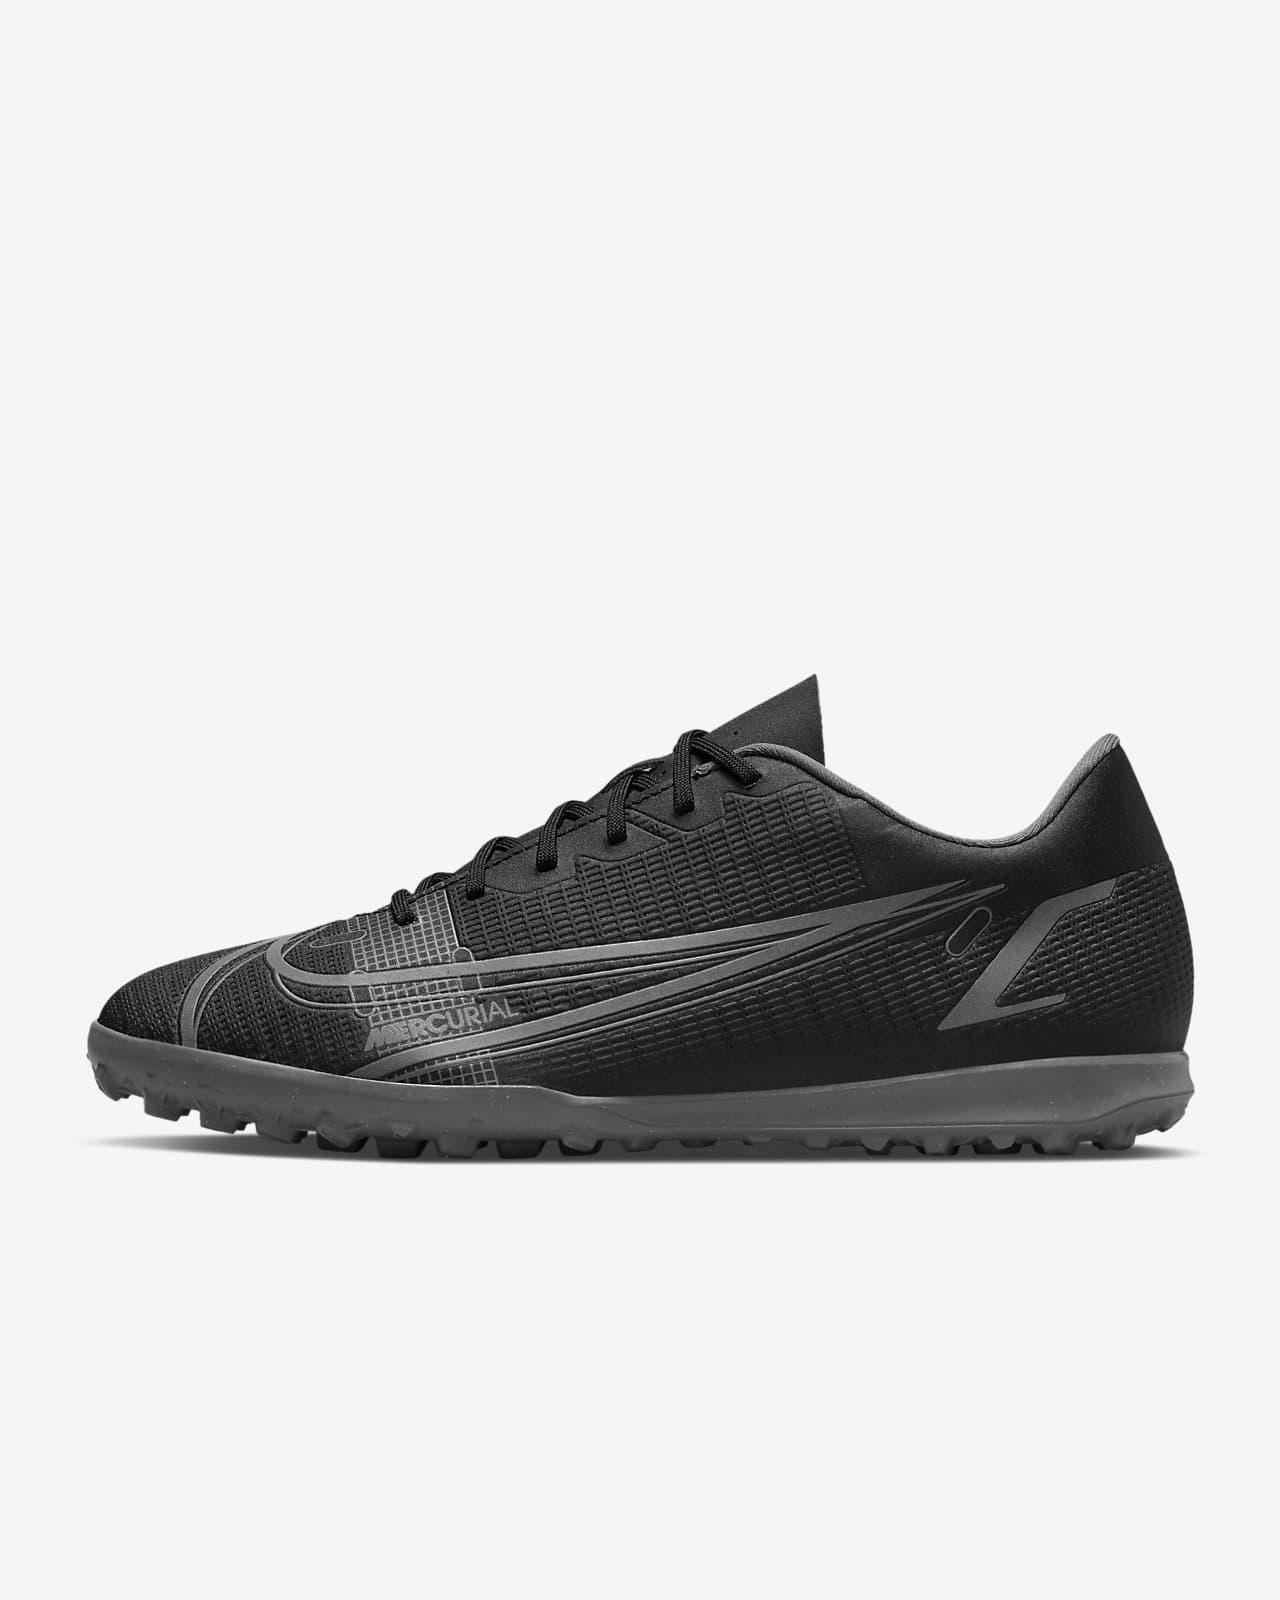 Nike Mercurial Vapor 14 Club TF Turf Football Shoe